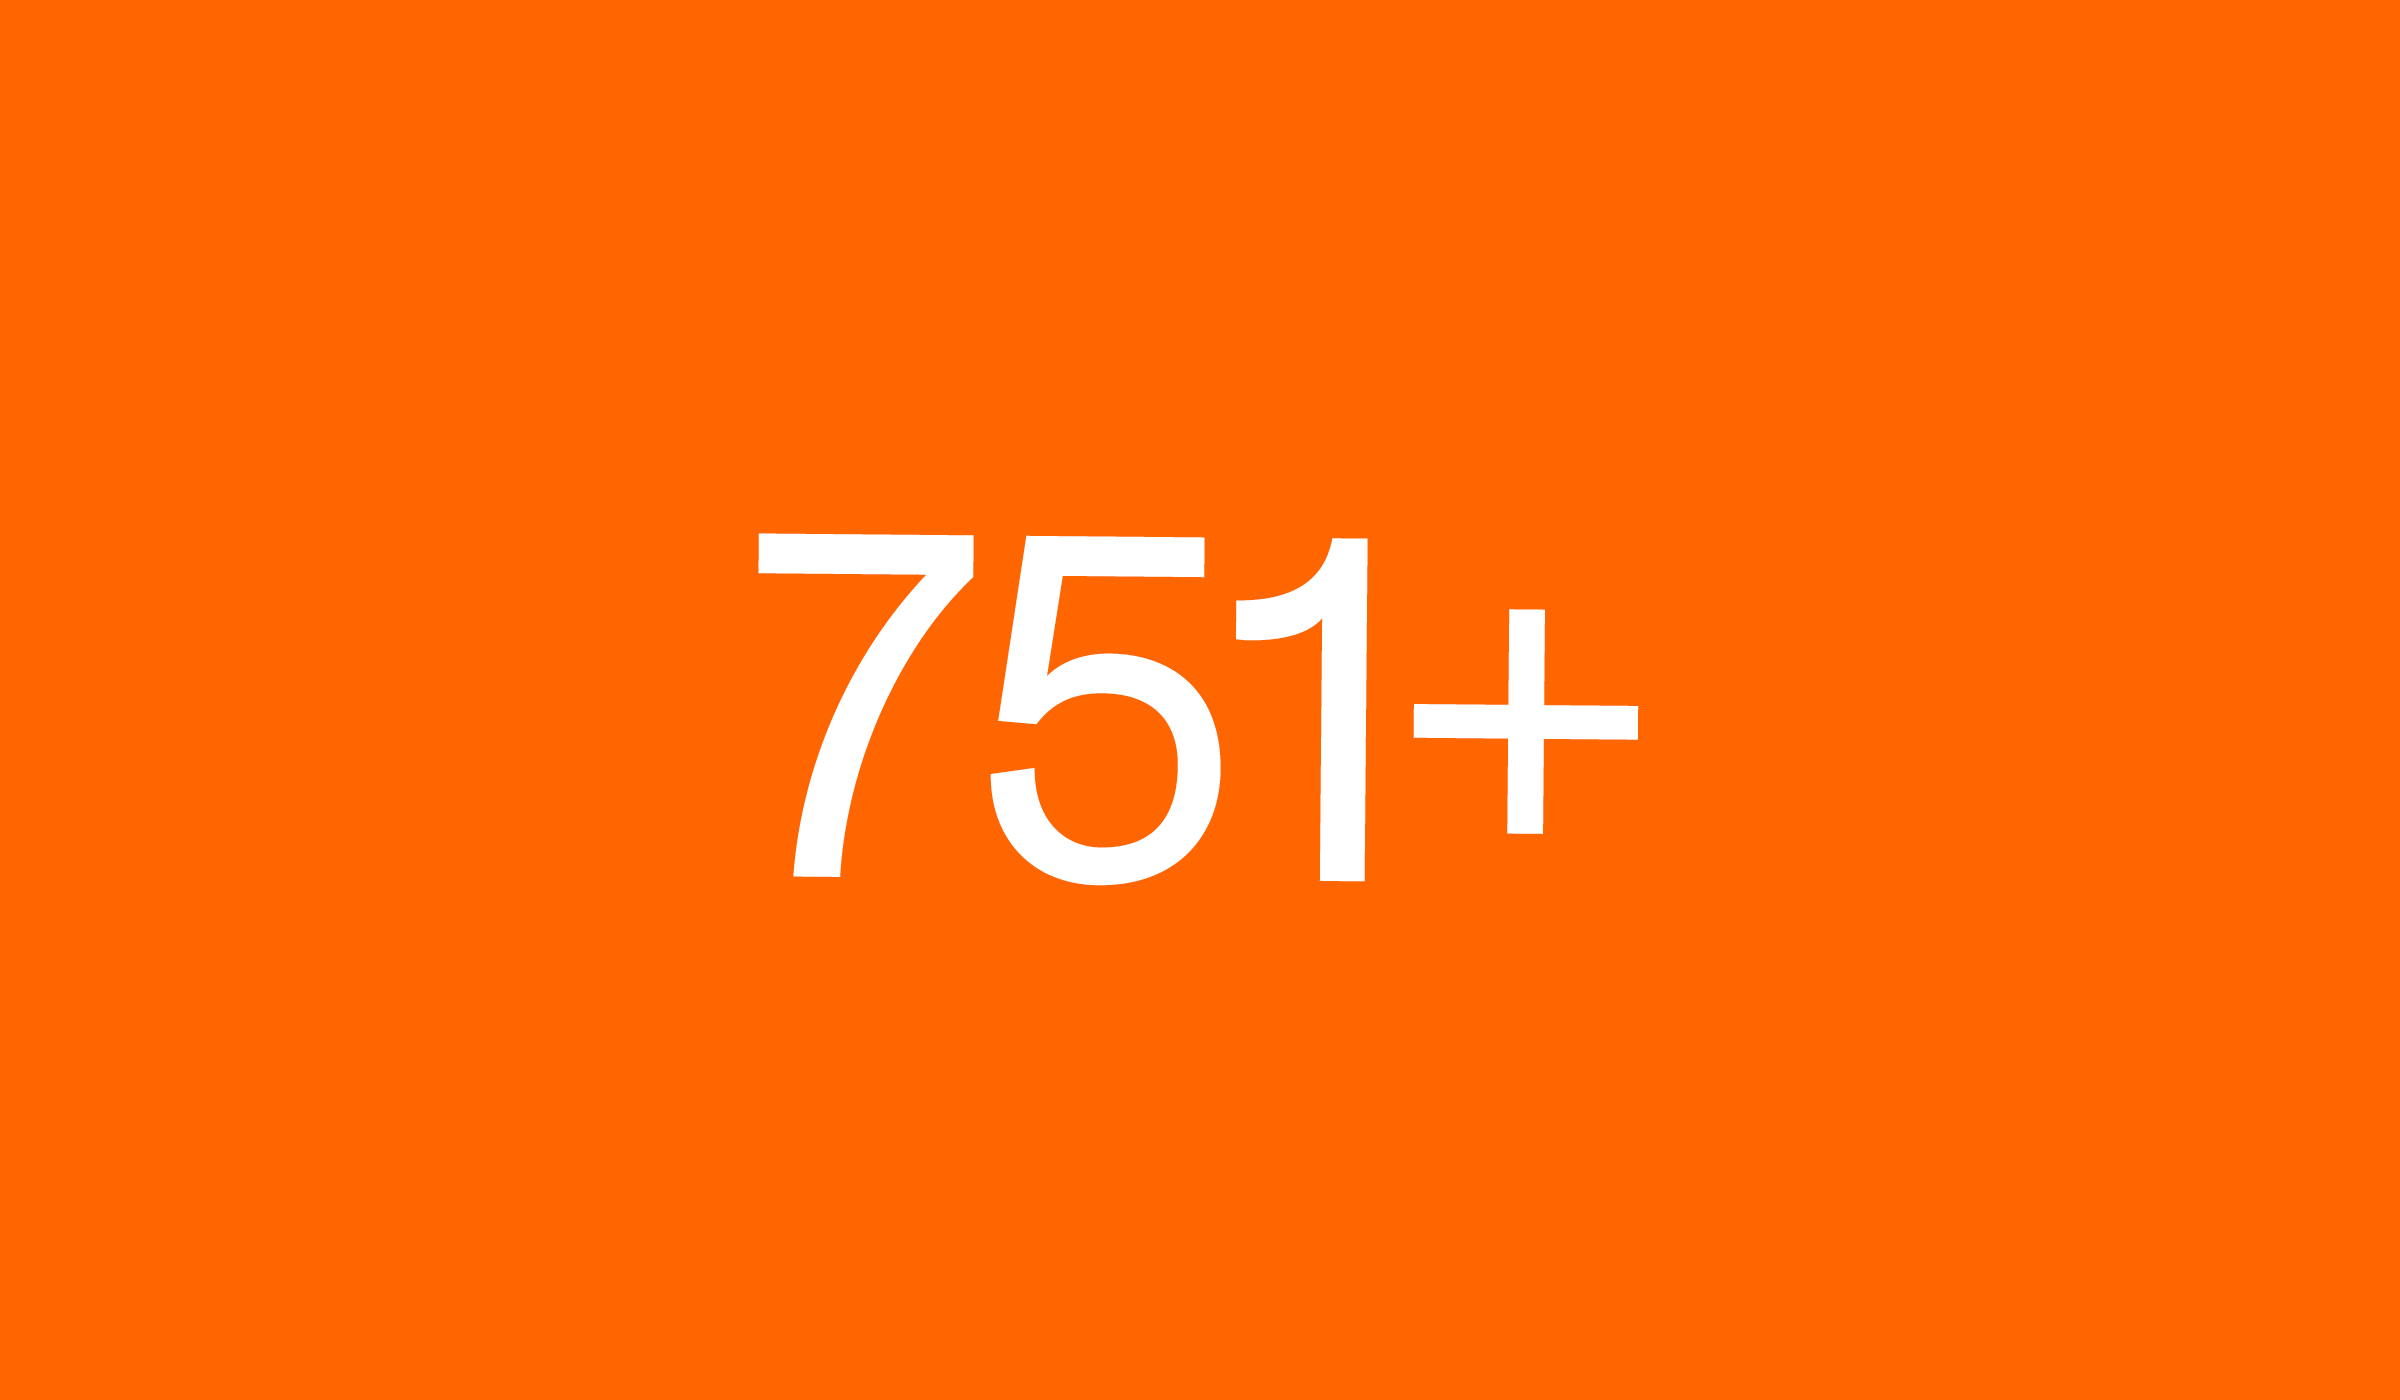 orange rectangle with white